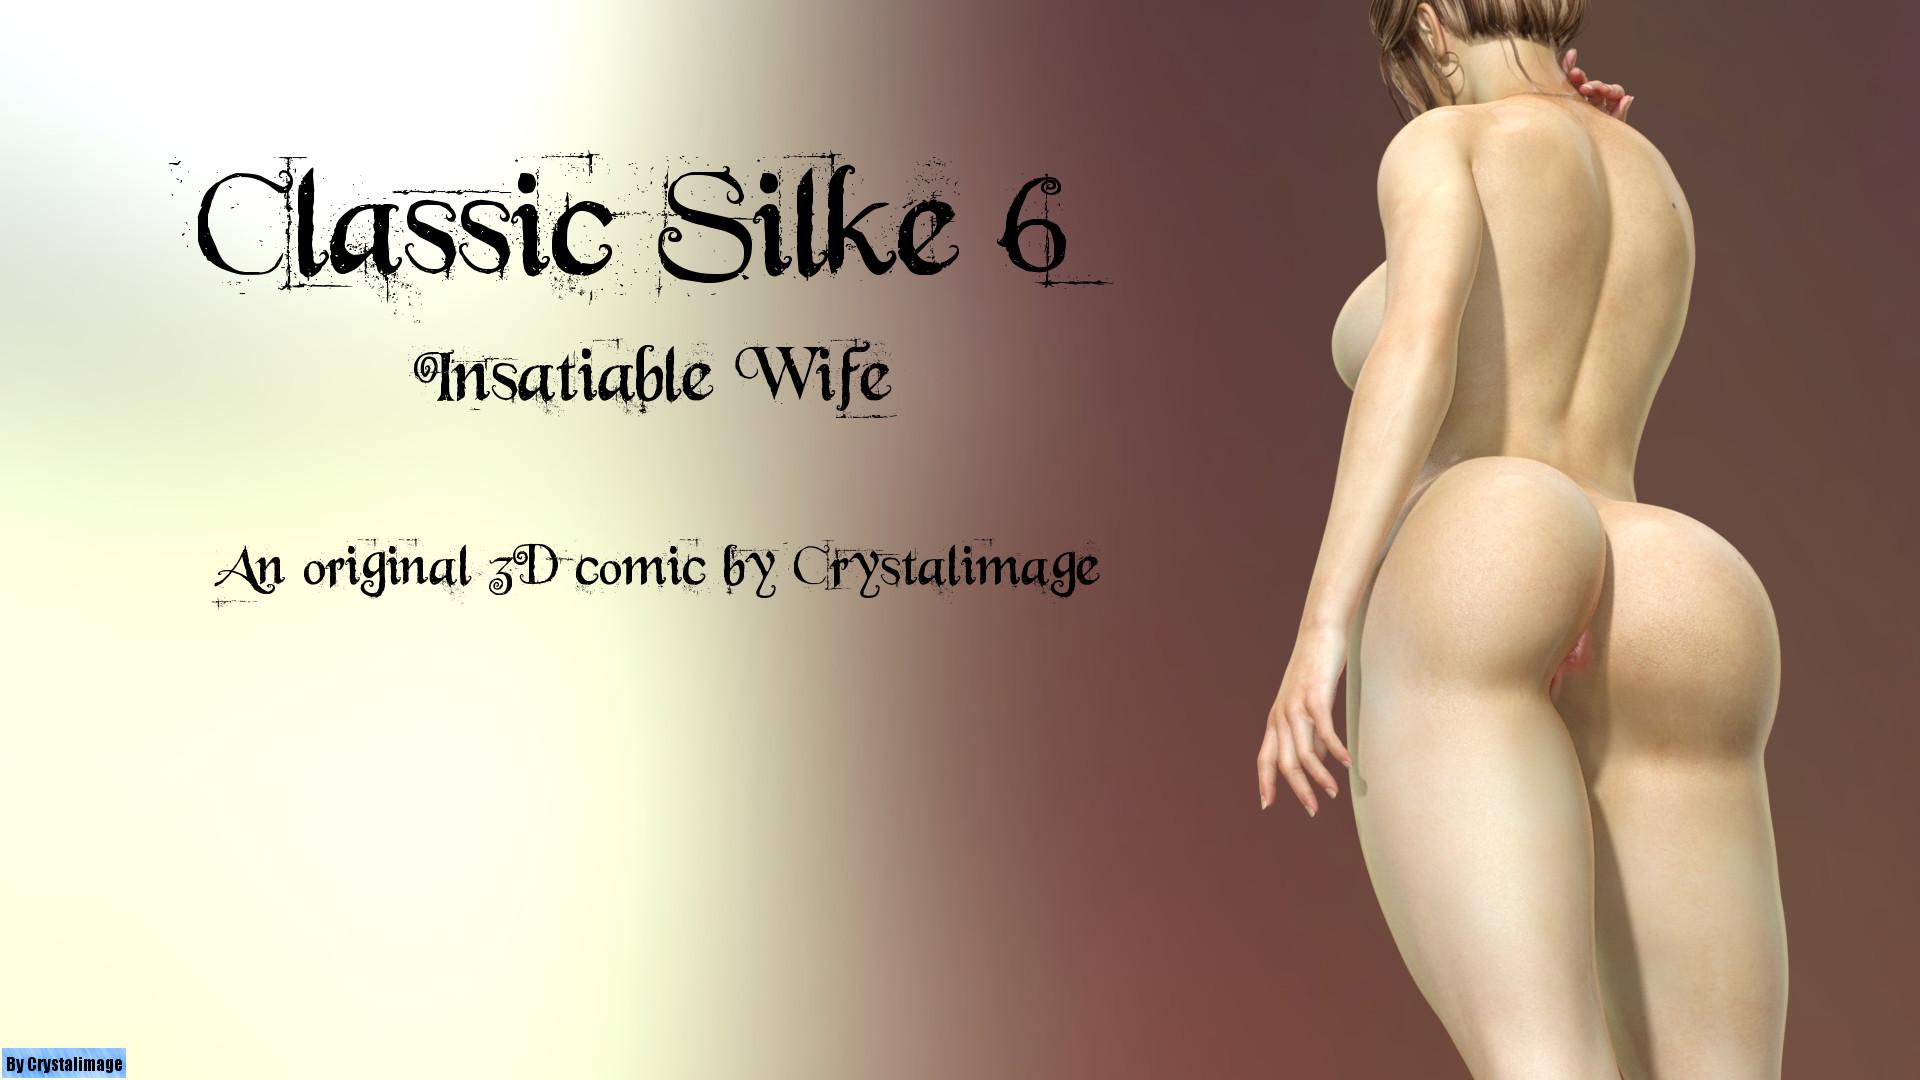 Classic Silke 6- Insatiable Wife image 1